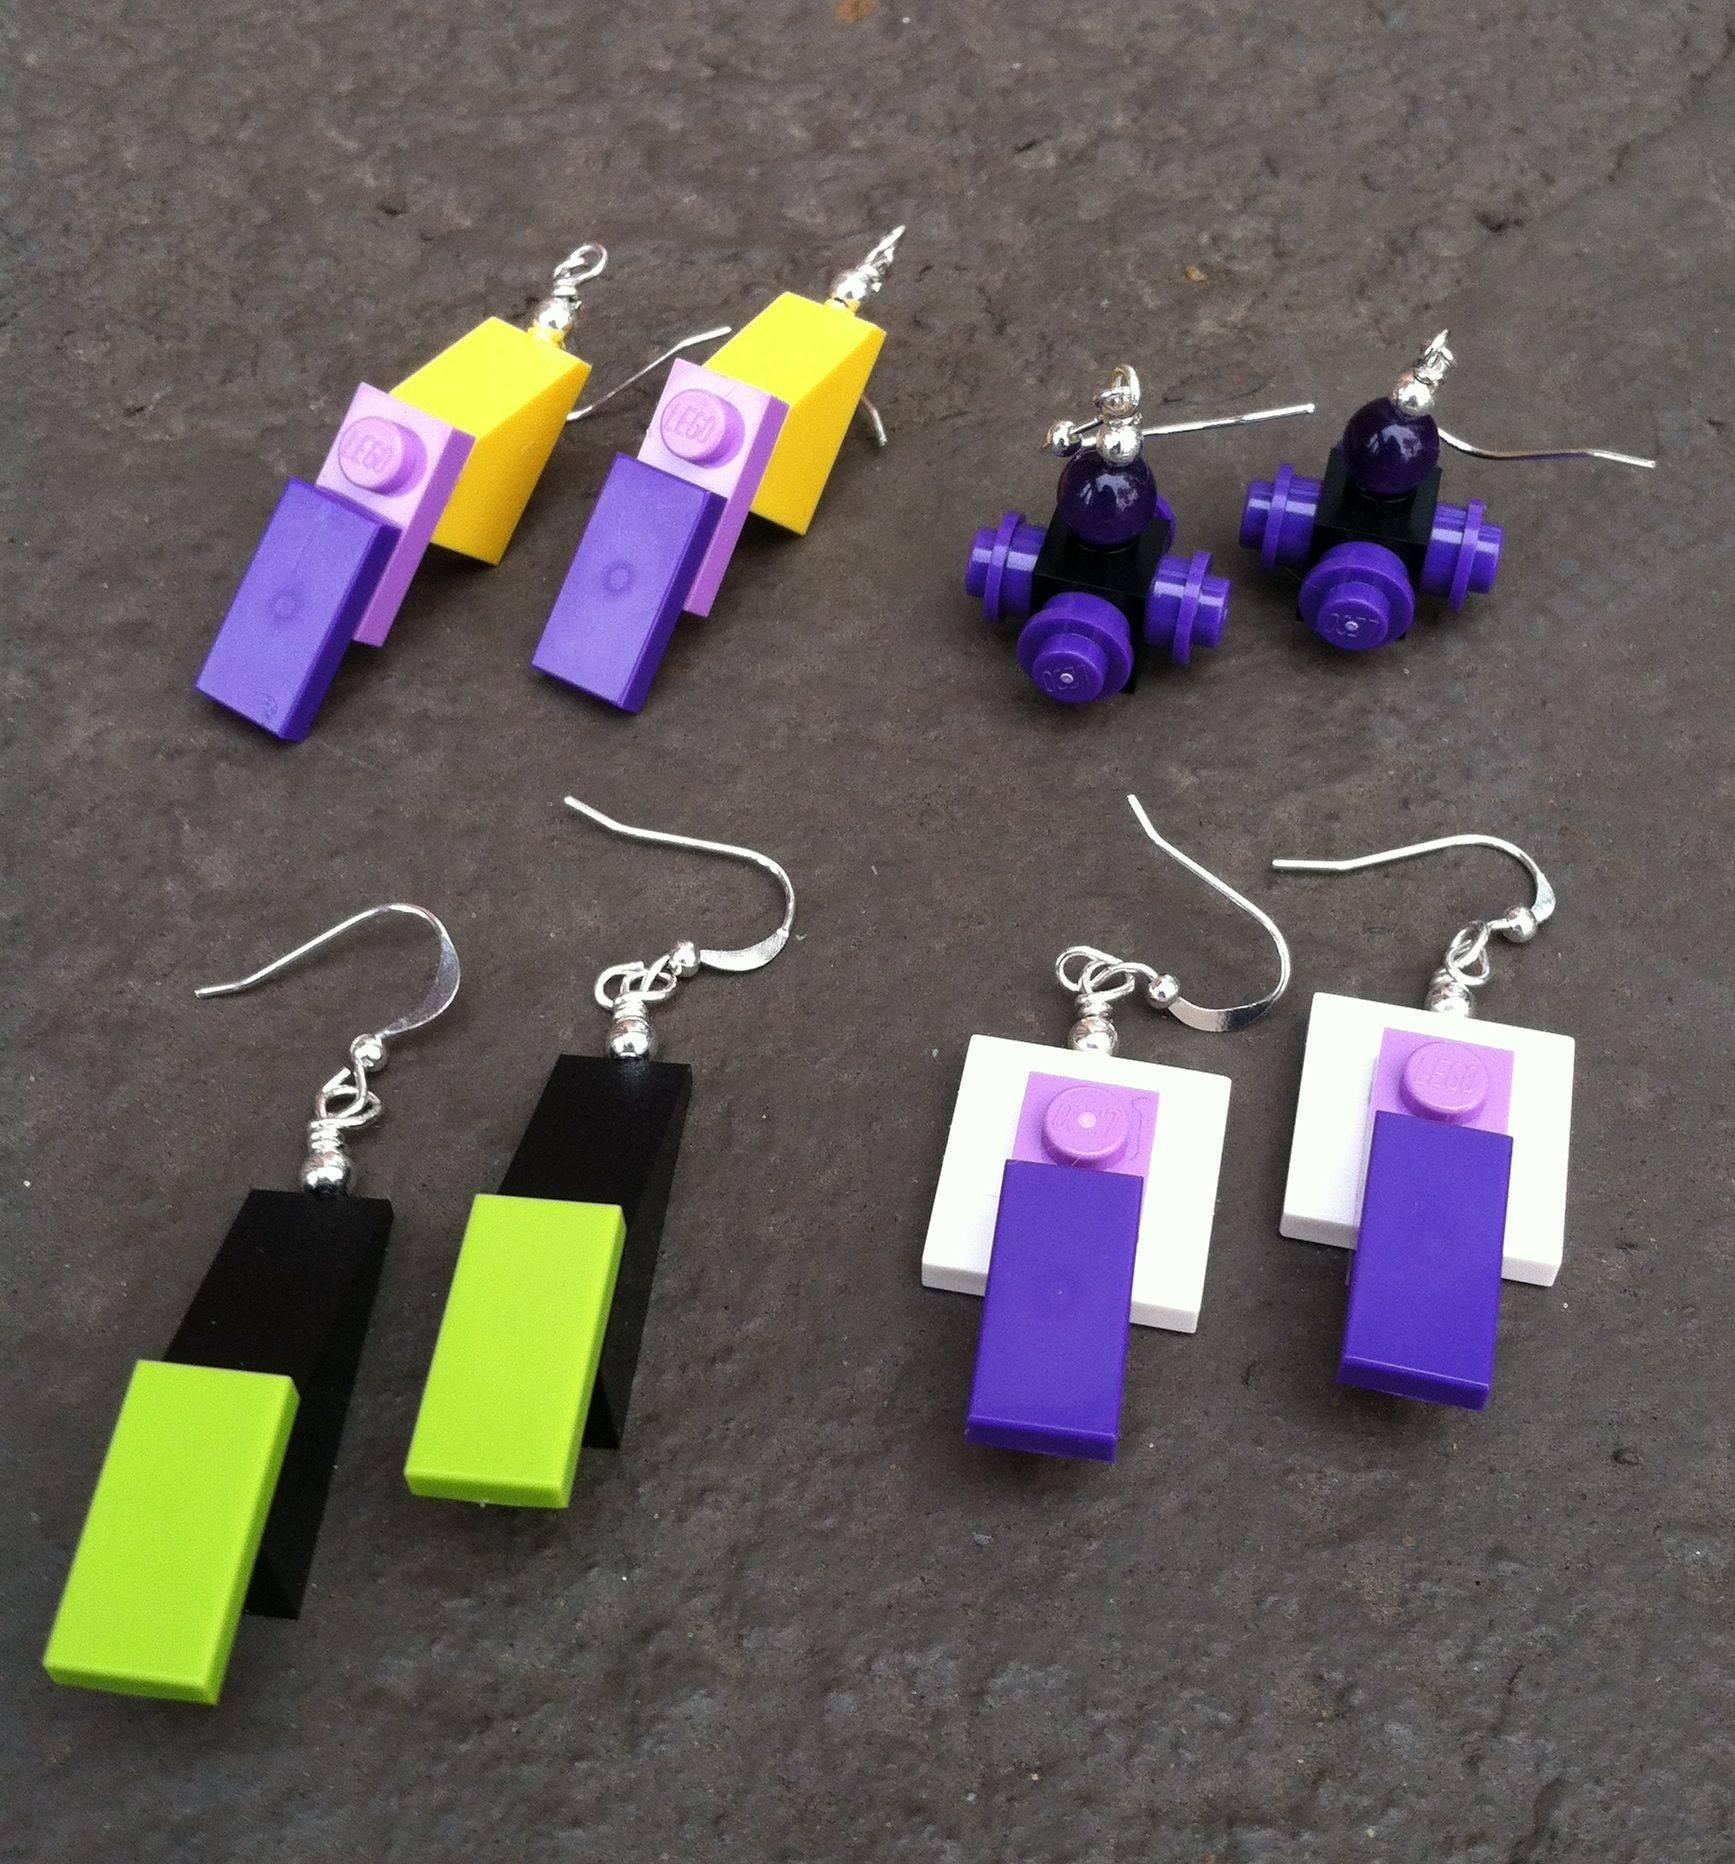 Adorable DIY Lego Earrings